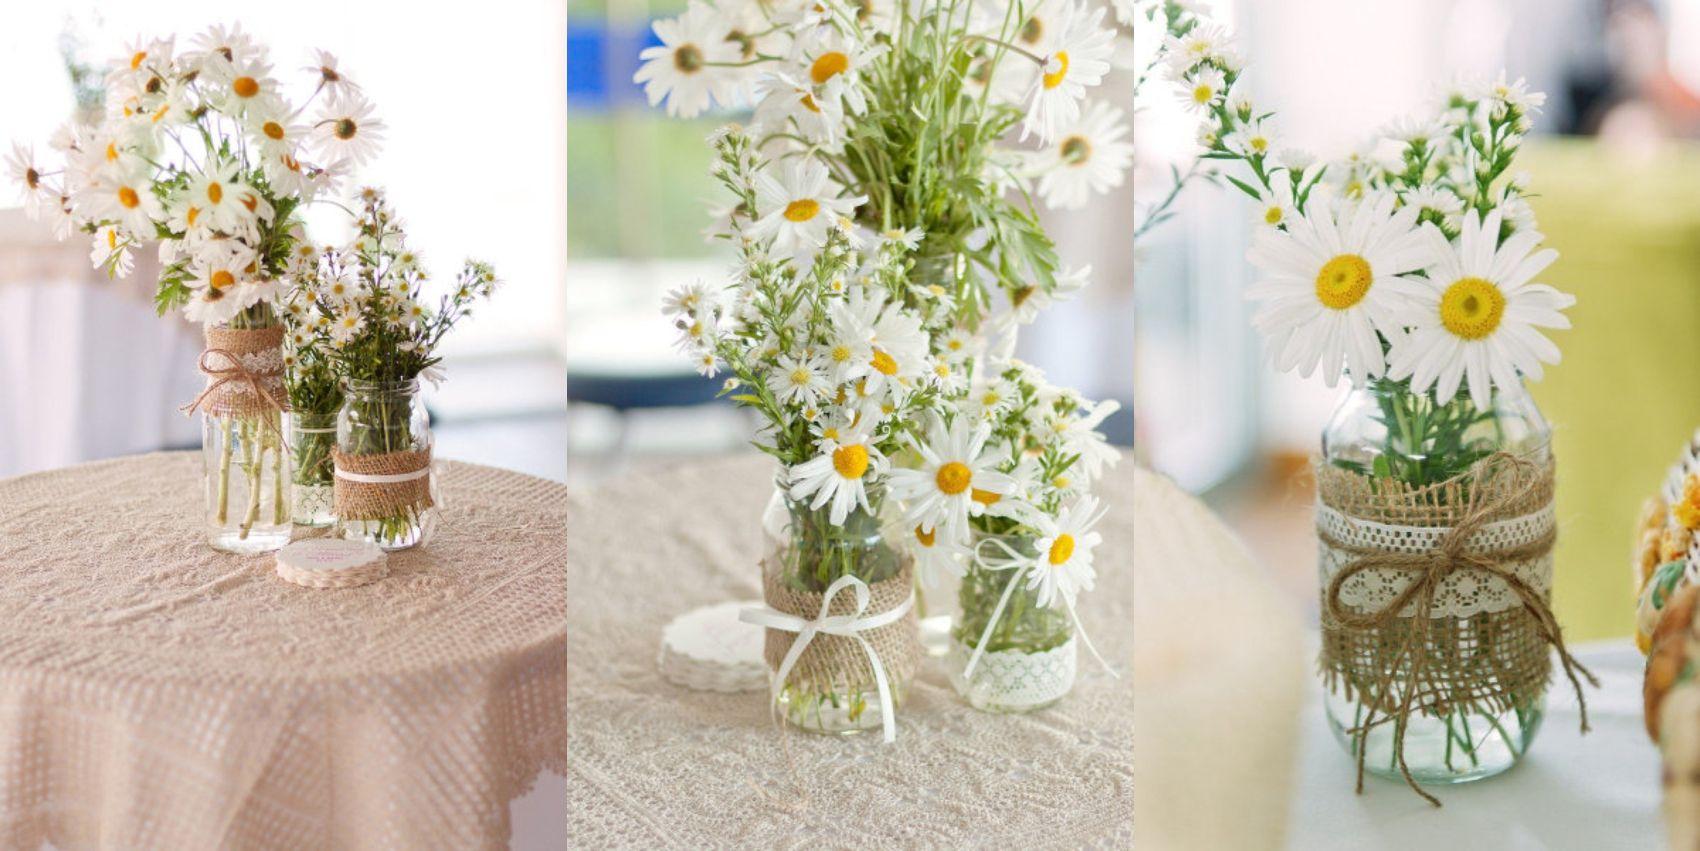 DIY Mason Jar Ideas | Burlap weddings, Wedding and Weddings